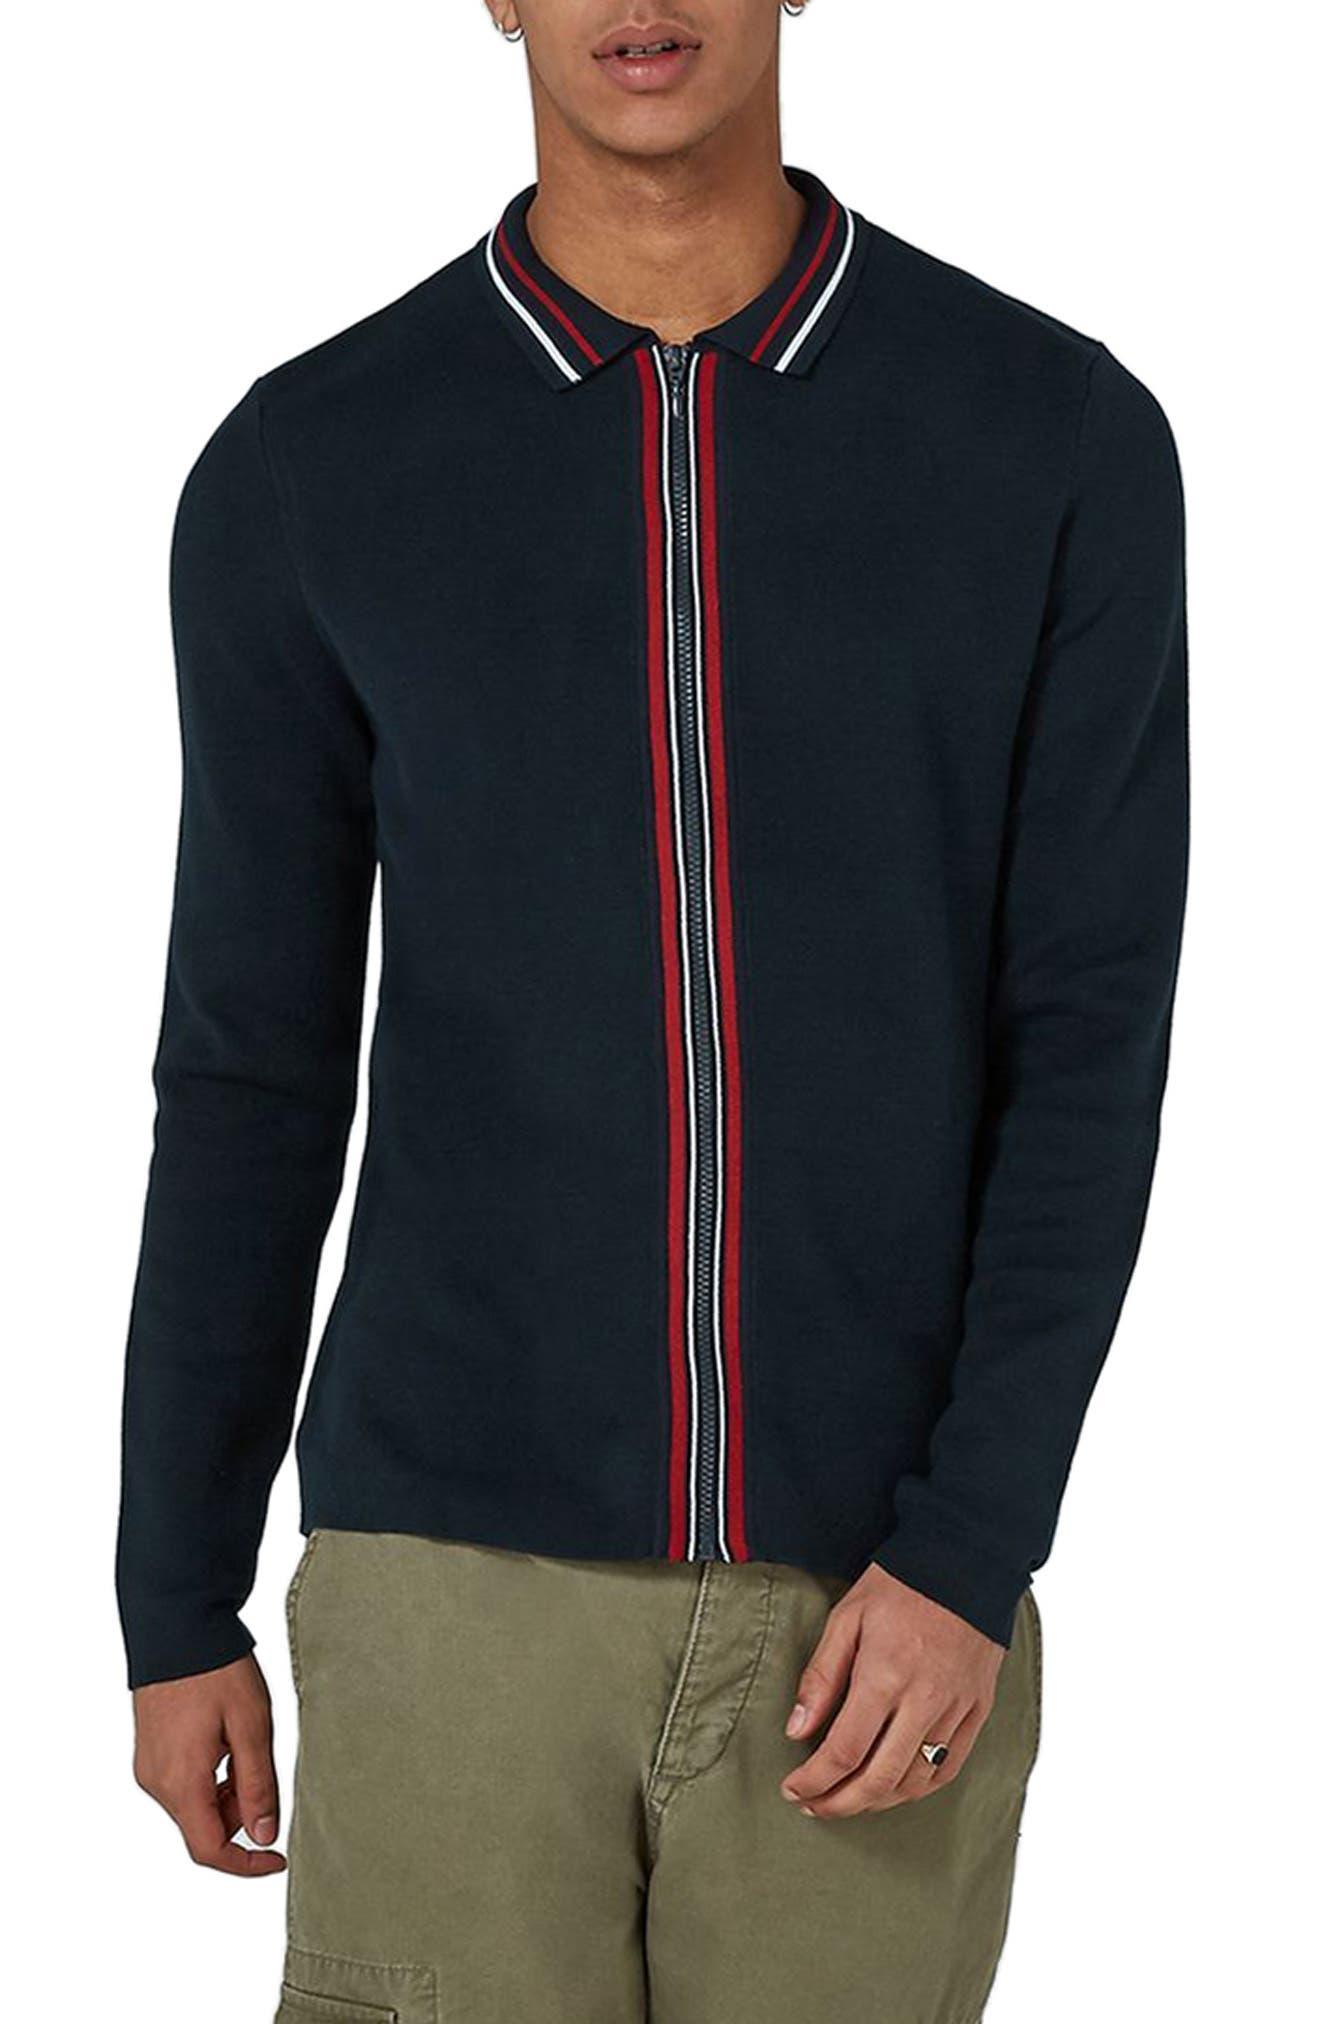 TOPMAN Stripe Knit Zip Front Harrington Sweatshirt, Main, color, 410